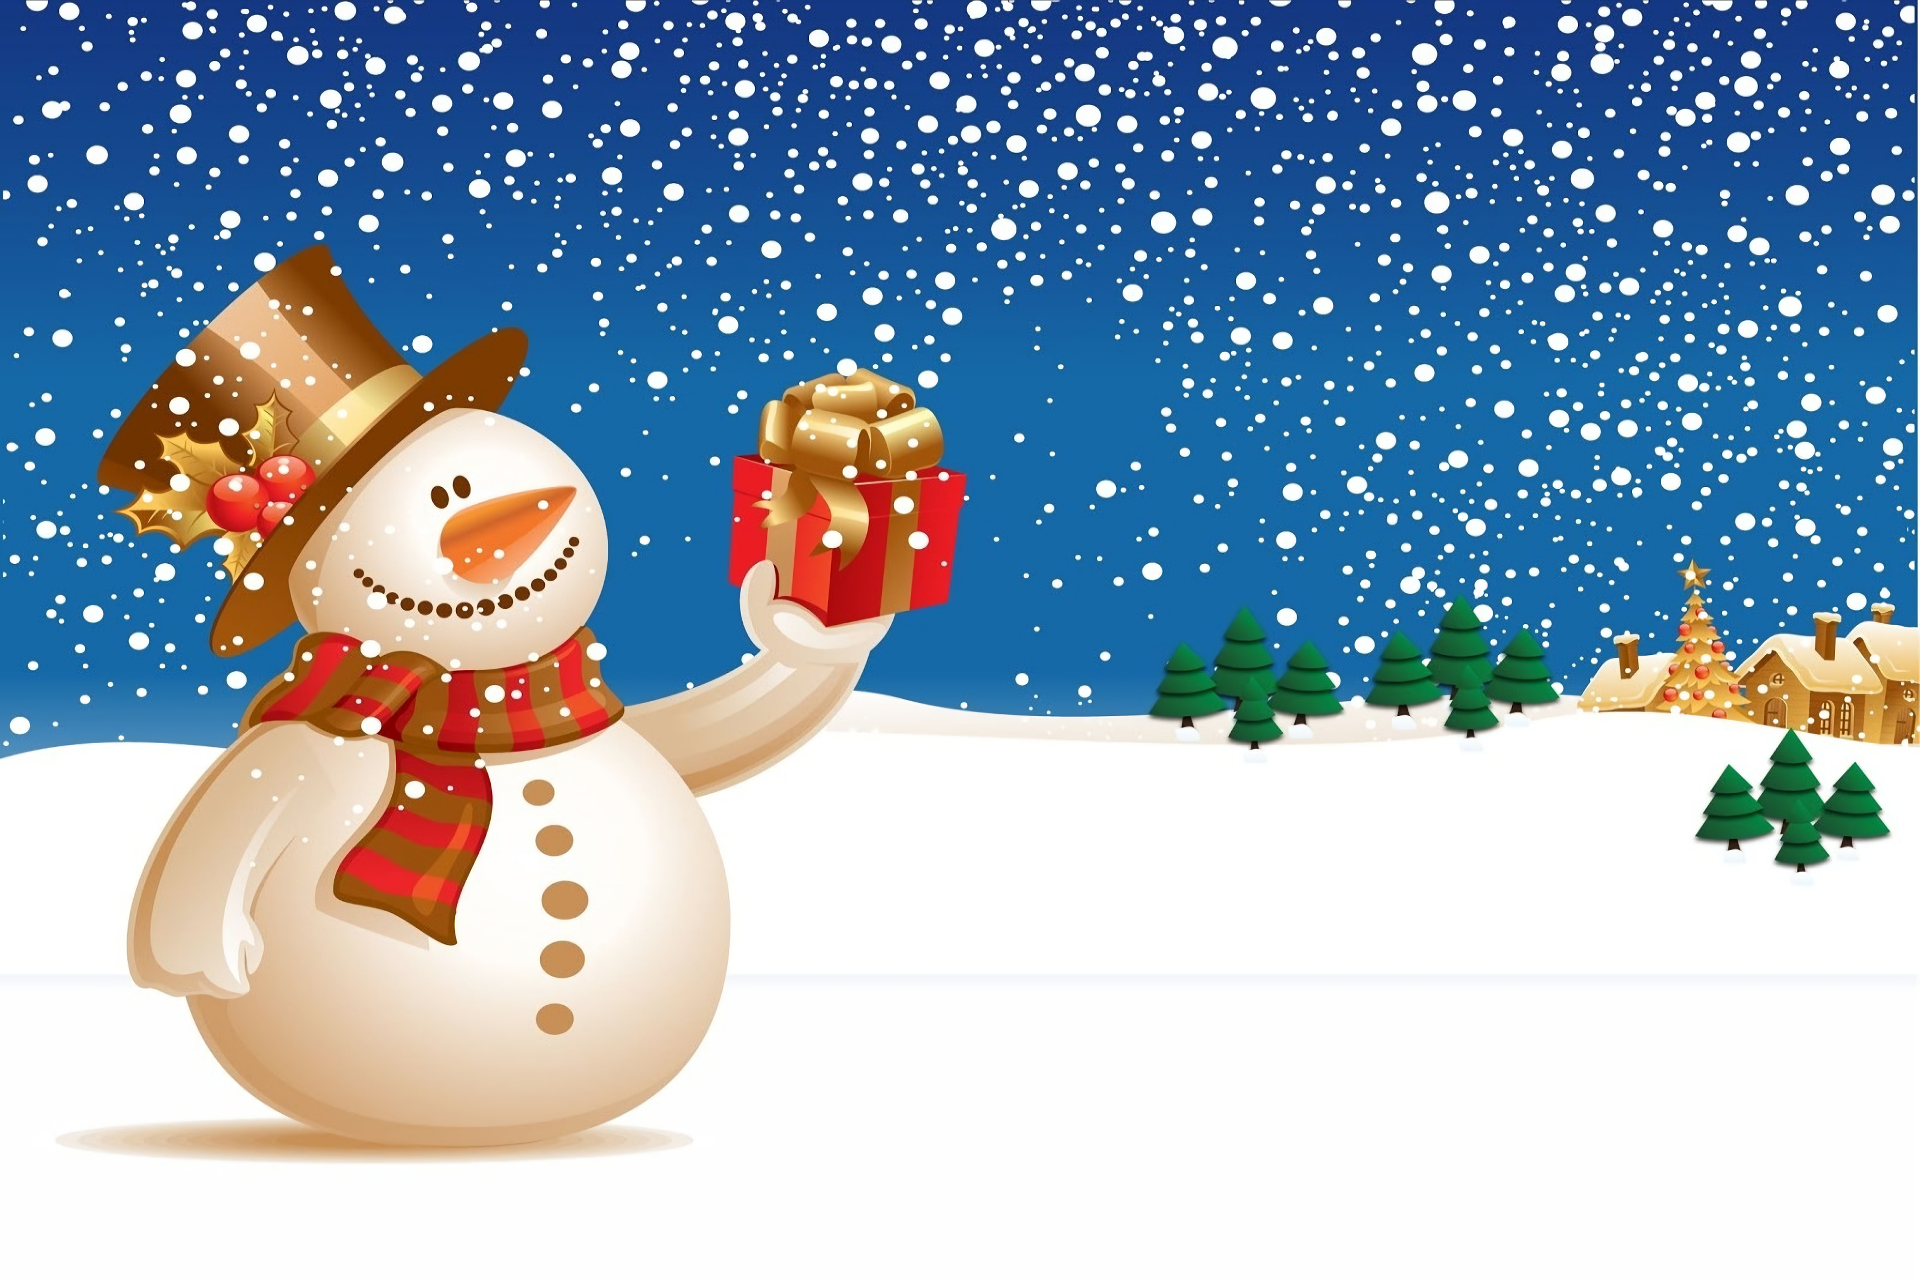 Holiday - Christmas  Snowman Gift Snow Snowfall Wallpaper